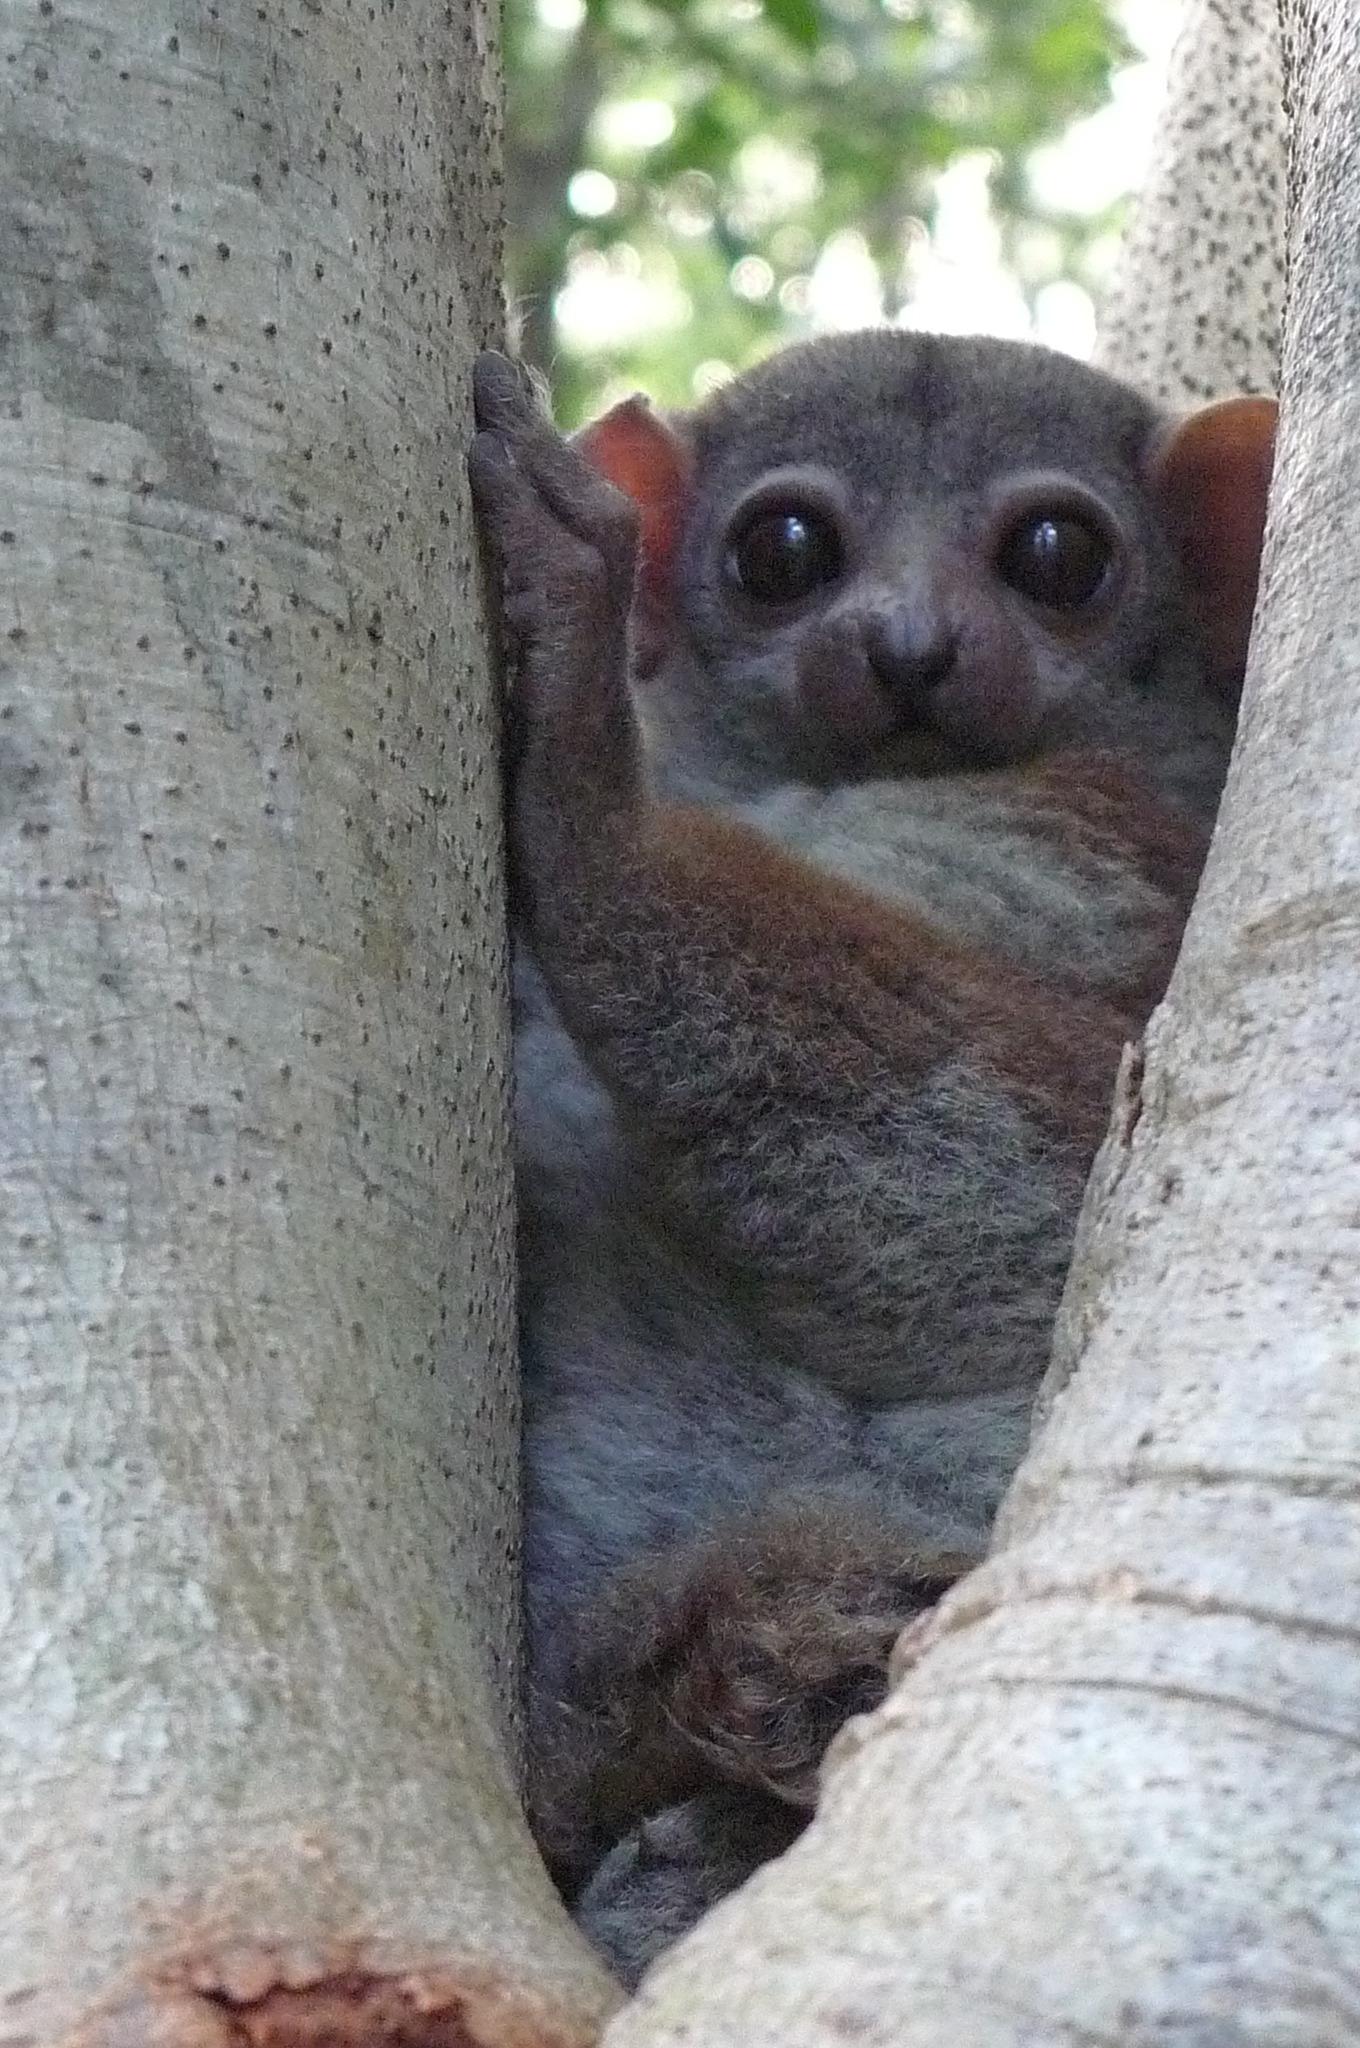 Image of Milne Edwards's sportive lemur